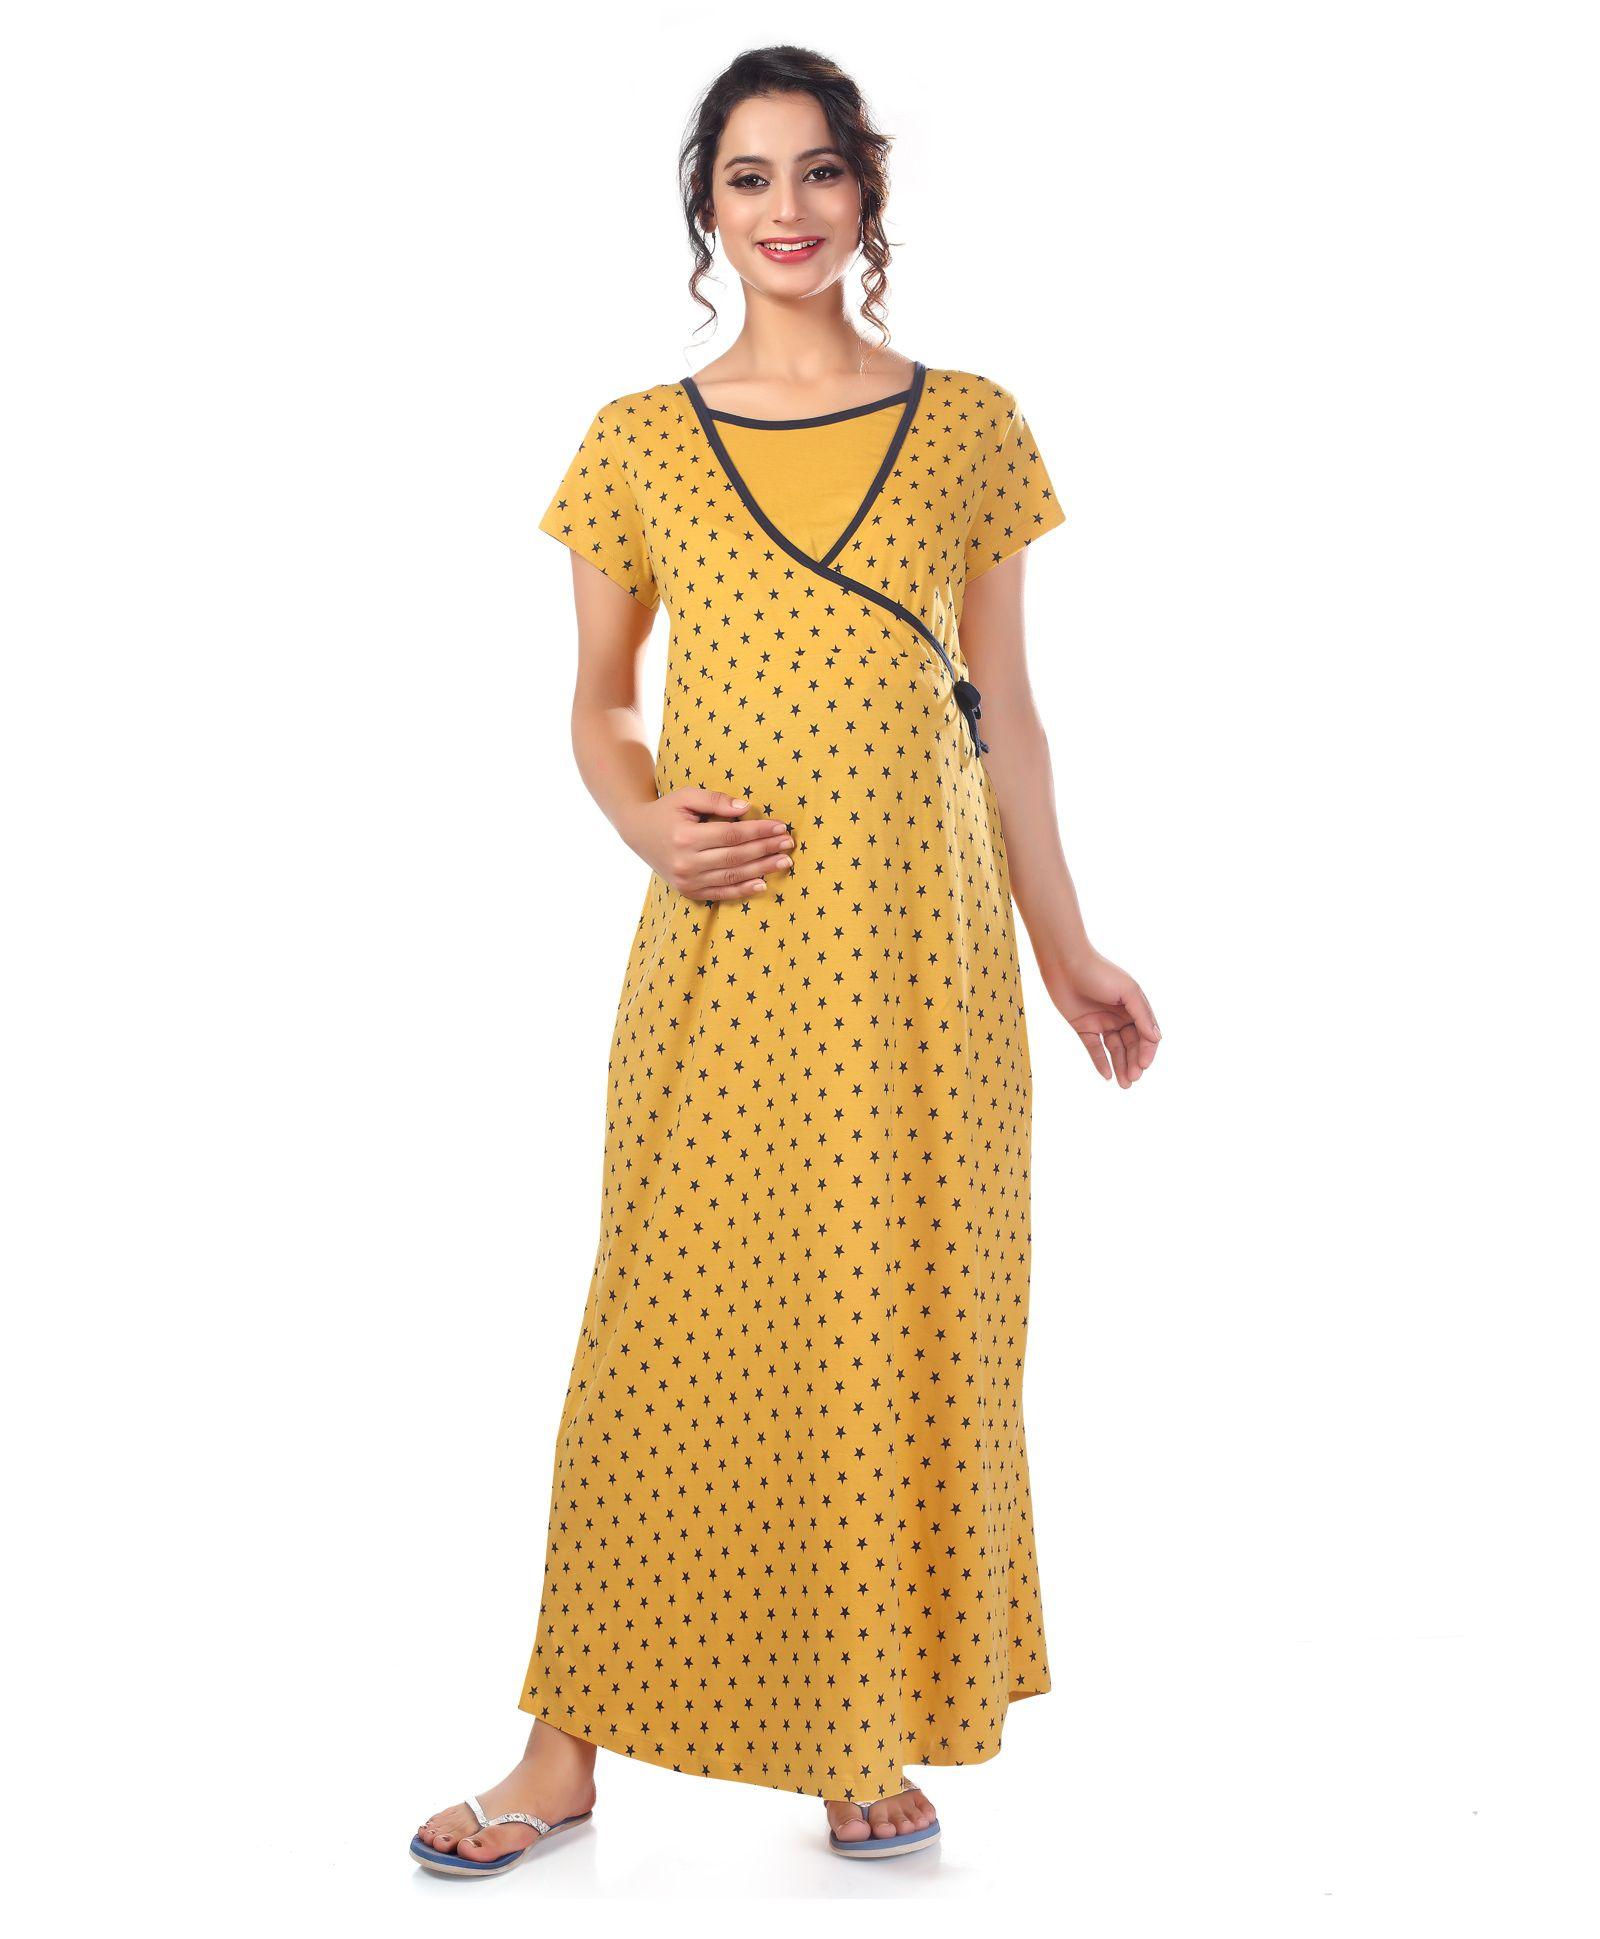 Kriti Short Sleeves Maternity Nursing Nighty Stars Print - Mustard Yellow 934163a15